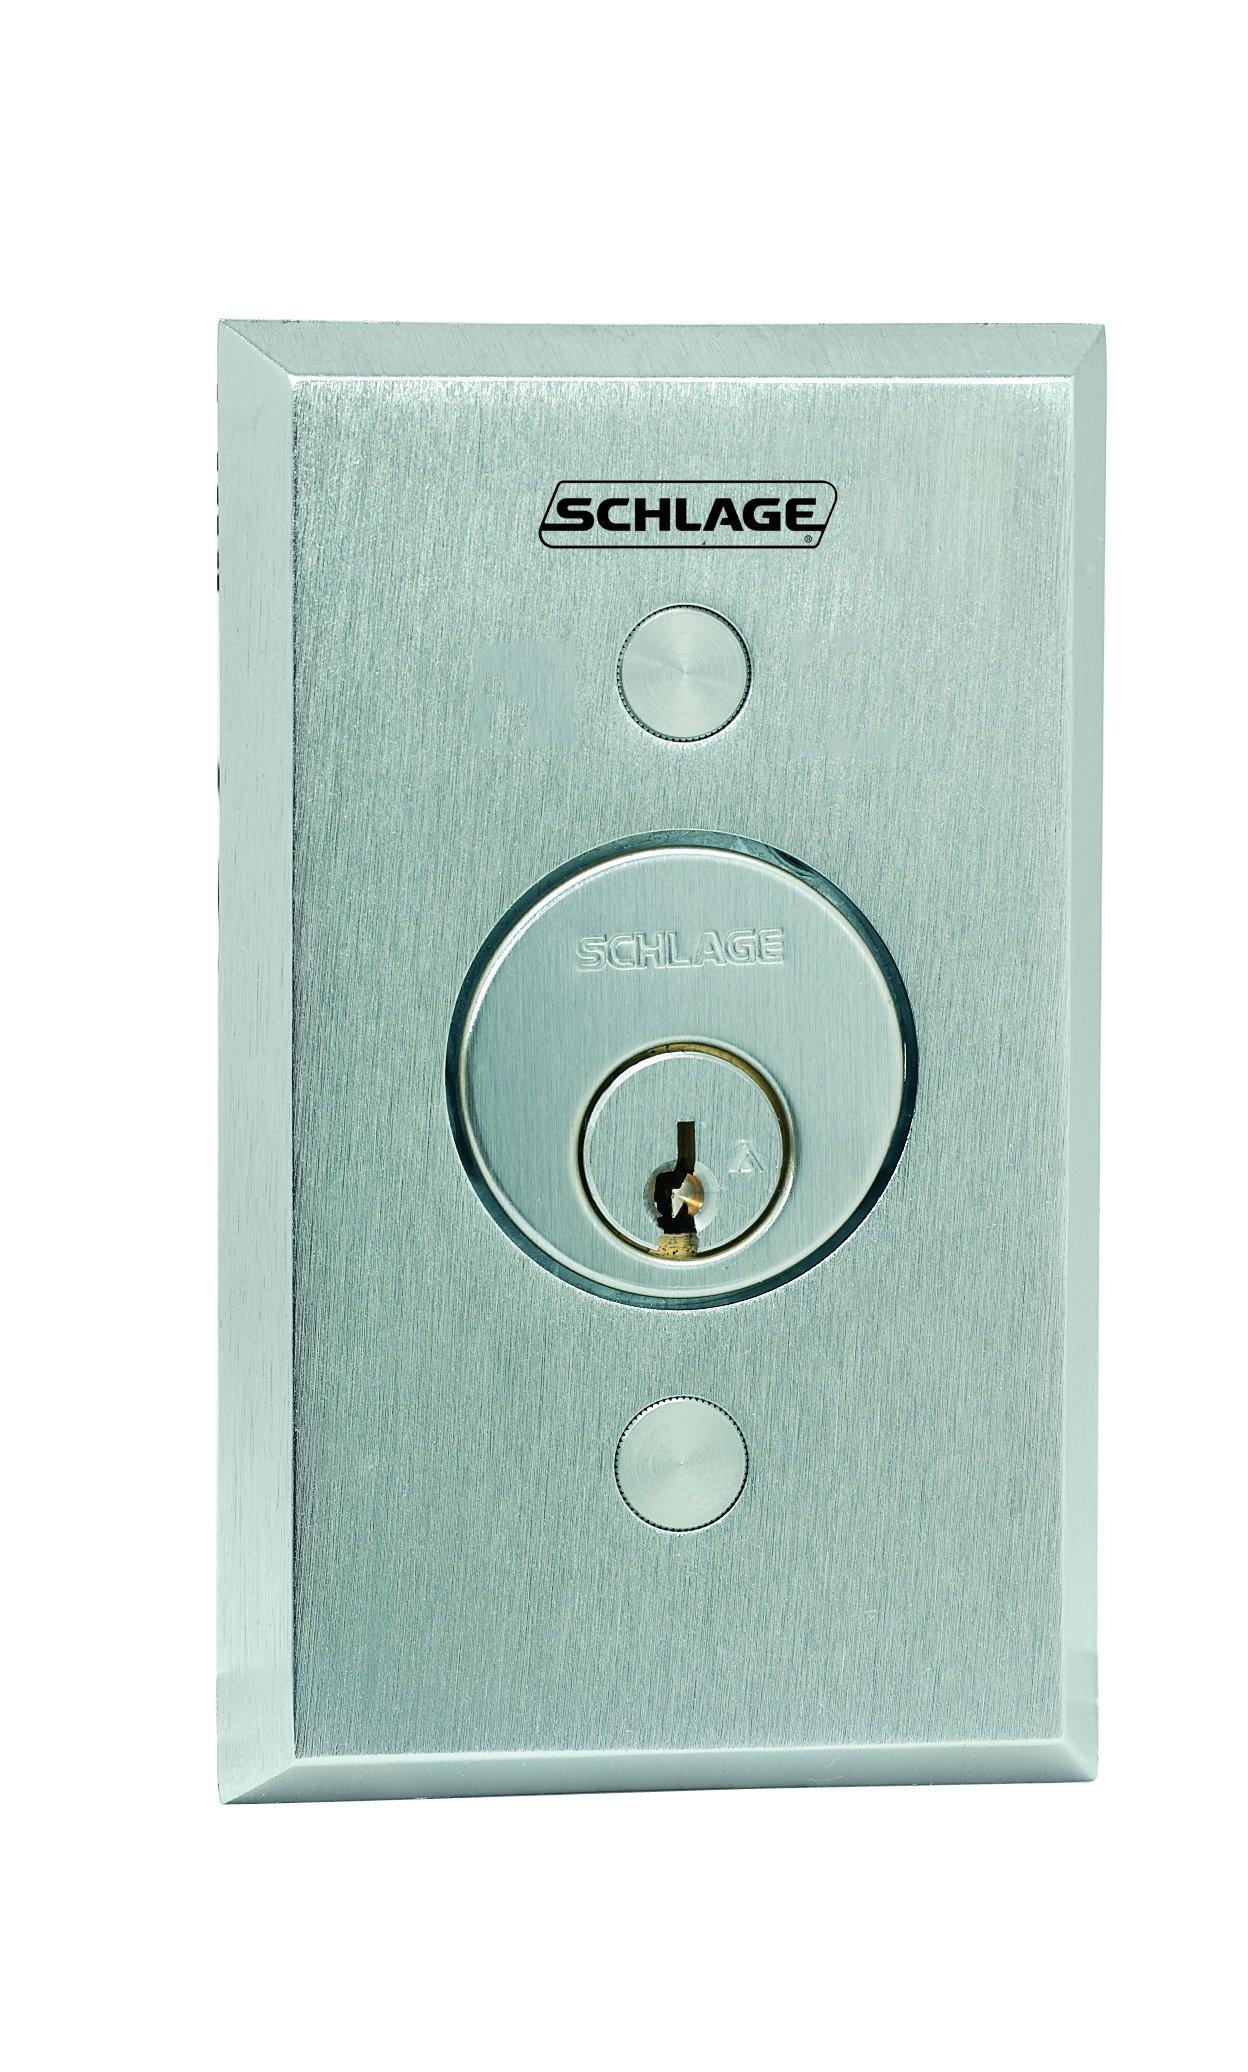 Schlage Electronics 653-04 Keyswitch, SPDT Maintained Single Direction, Satin Chrome Finish